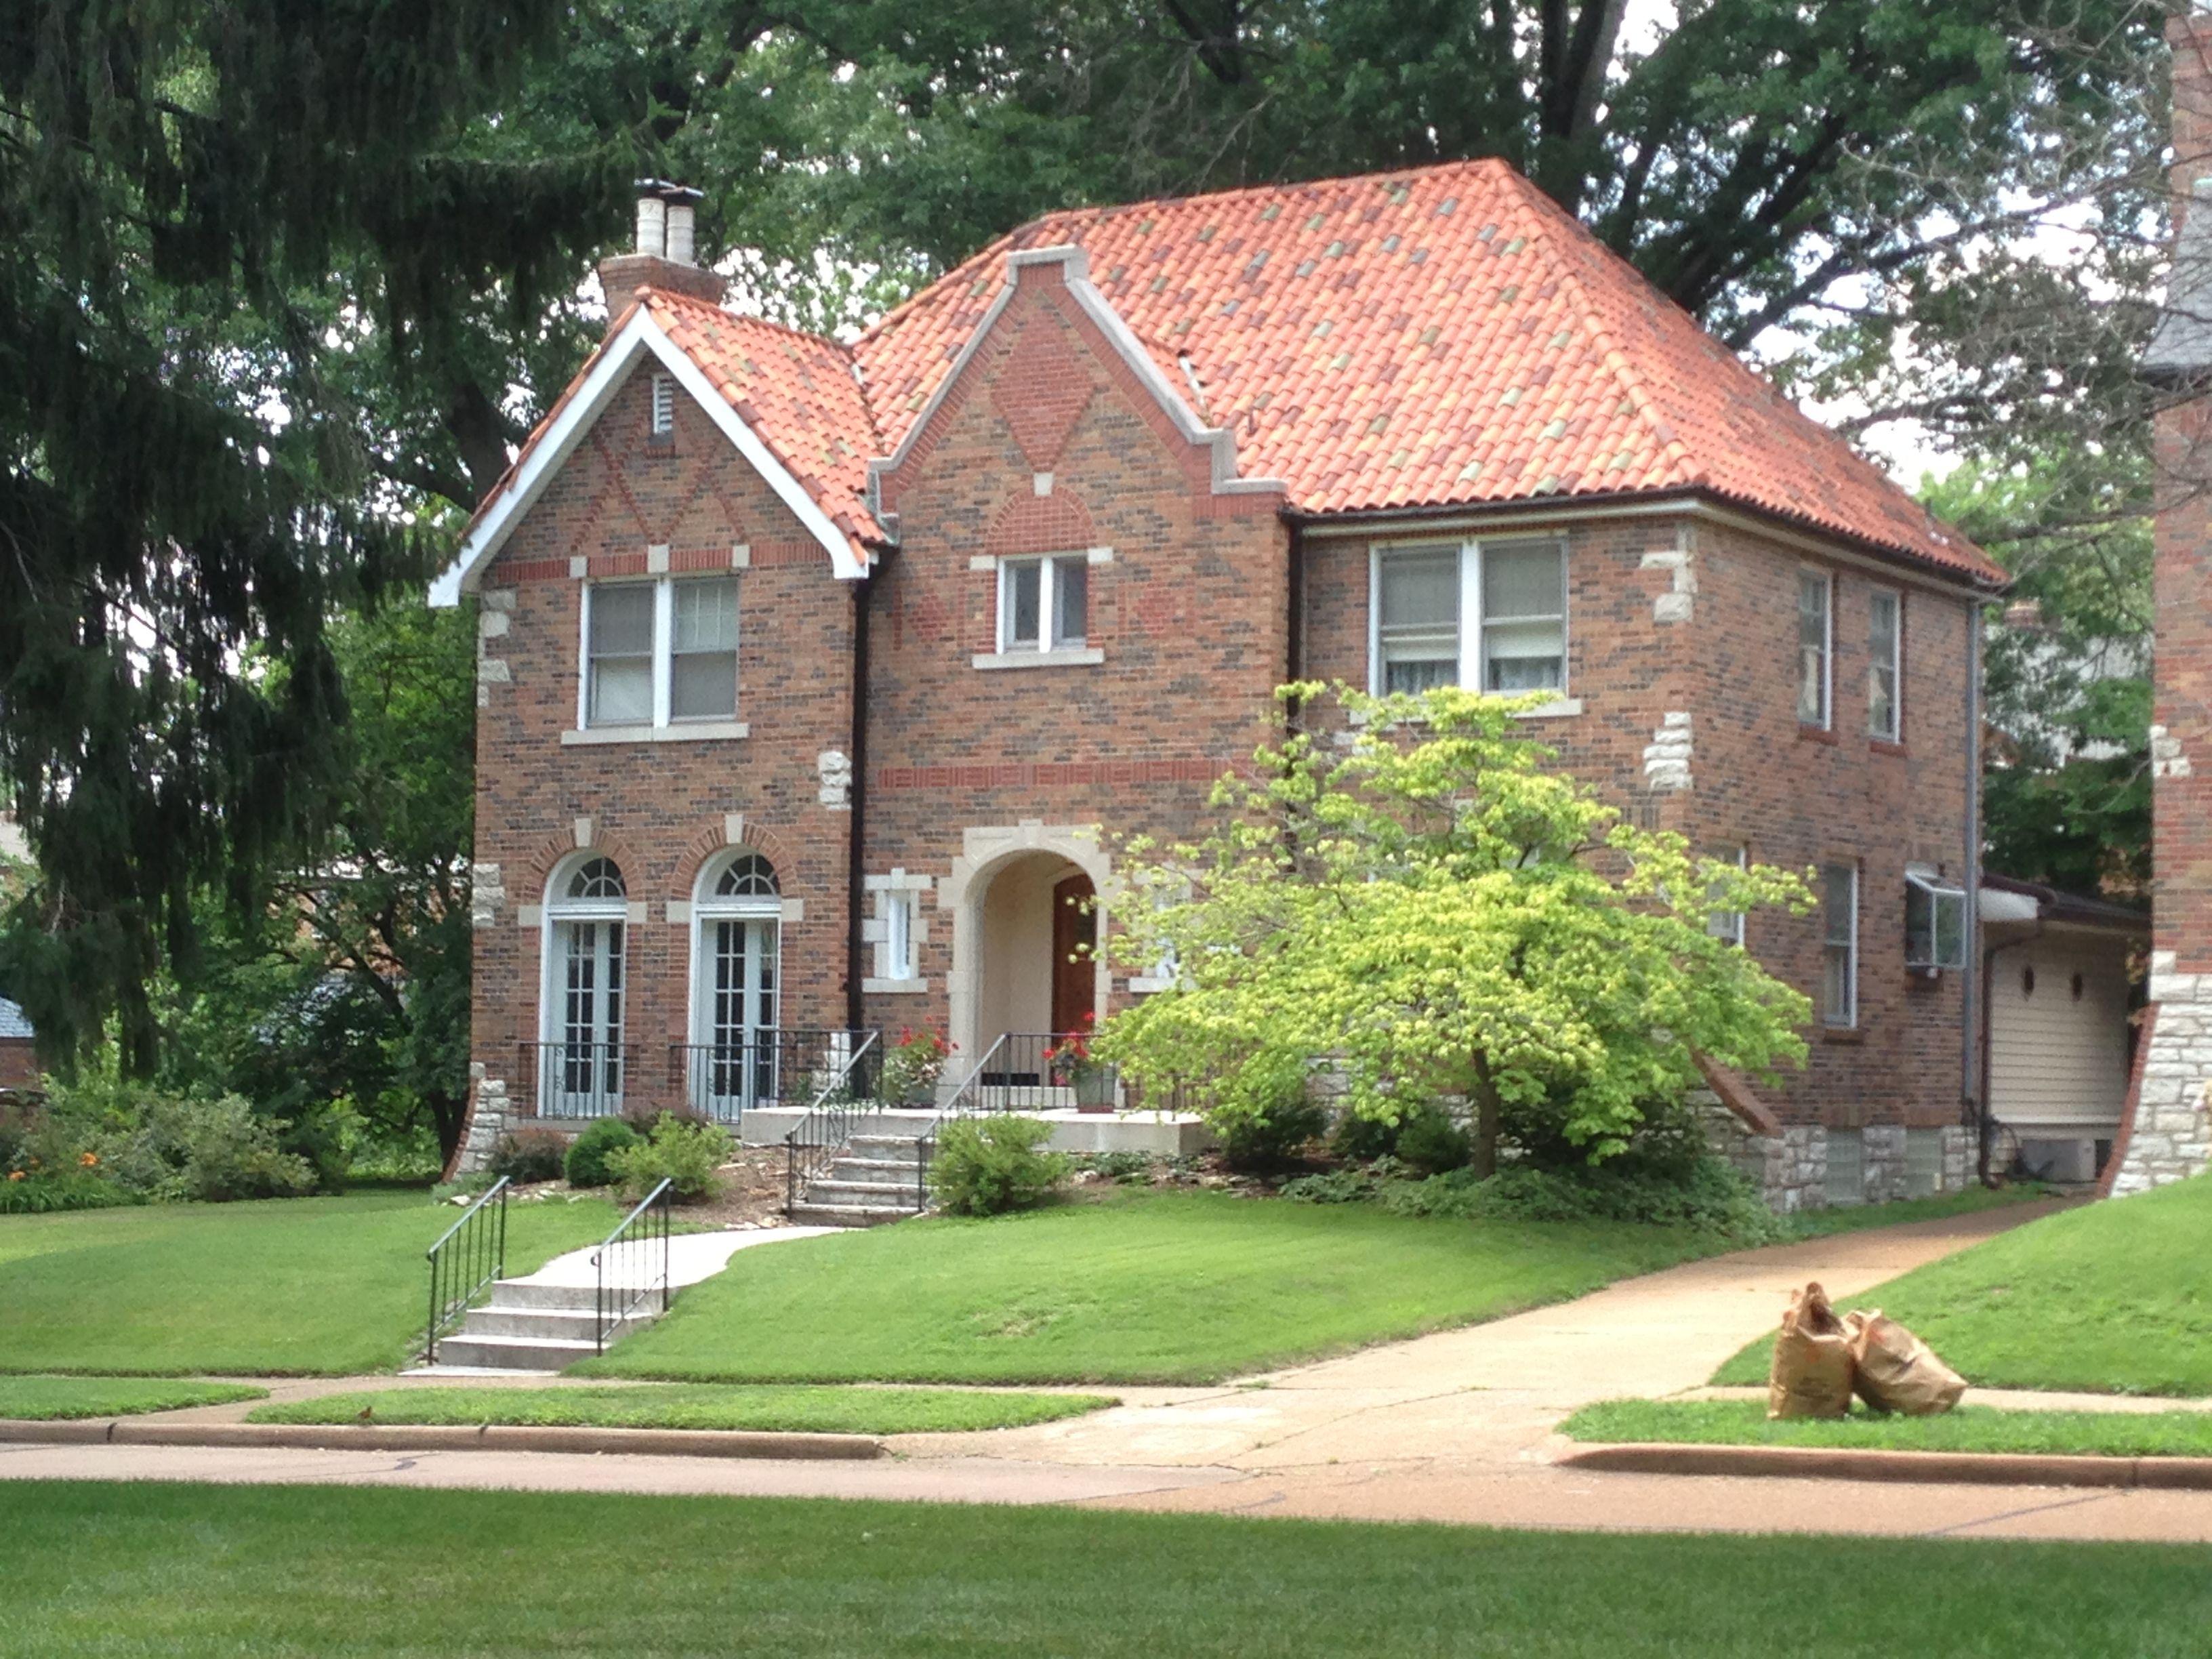 Best Pasadena Hills Mo Brick Tudor Eclectic With Terra Cotta 640 x 480